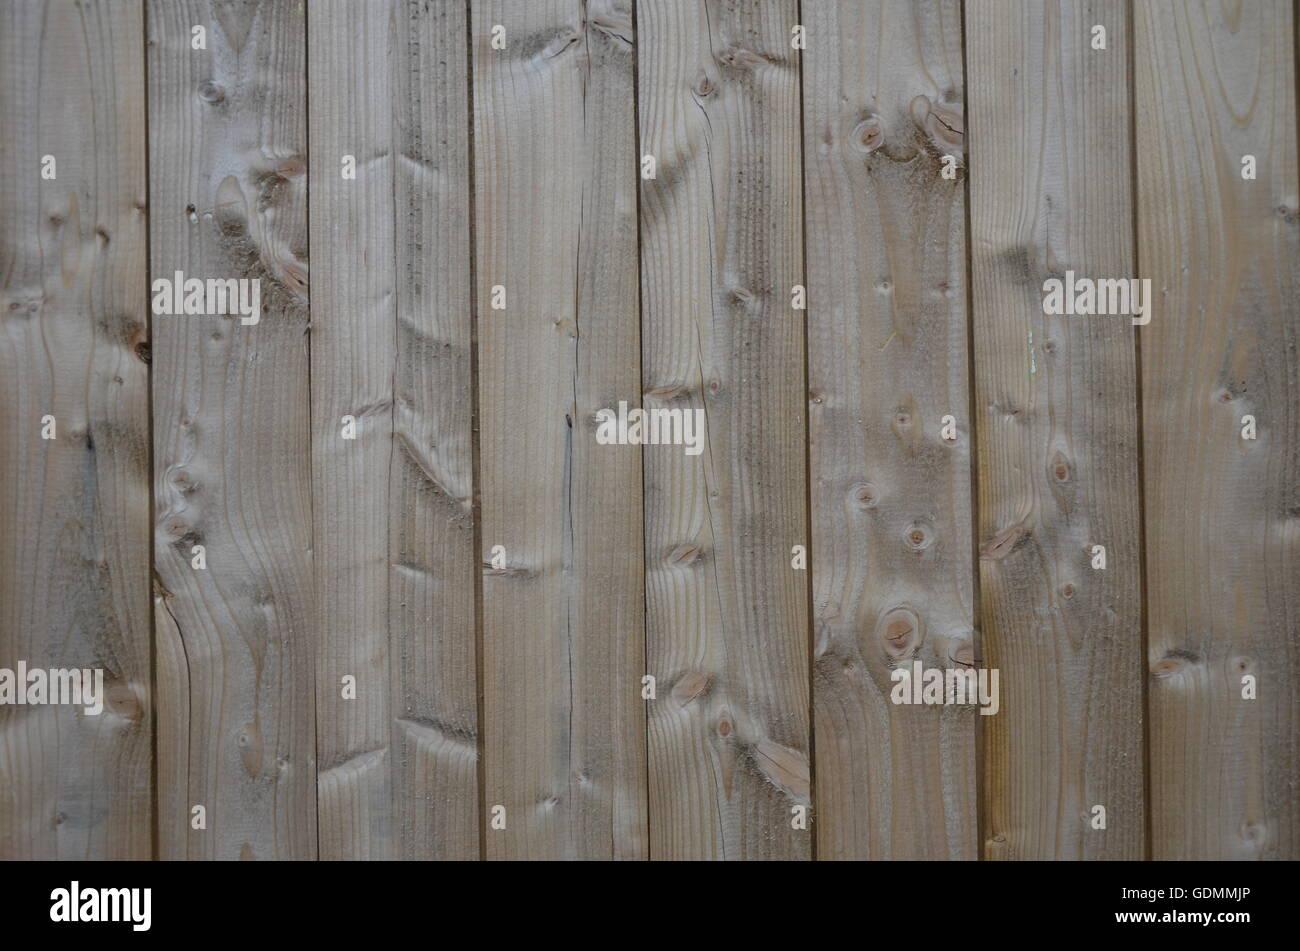 Boden Holz Pvc Holz Architektur Fuaboden Genial Fusboden Ehrfurchtiges